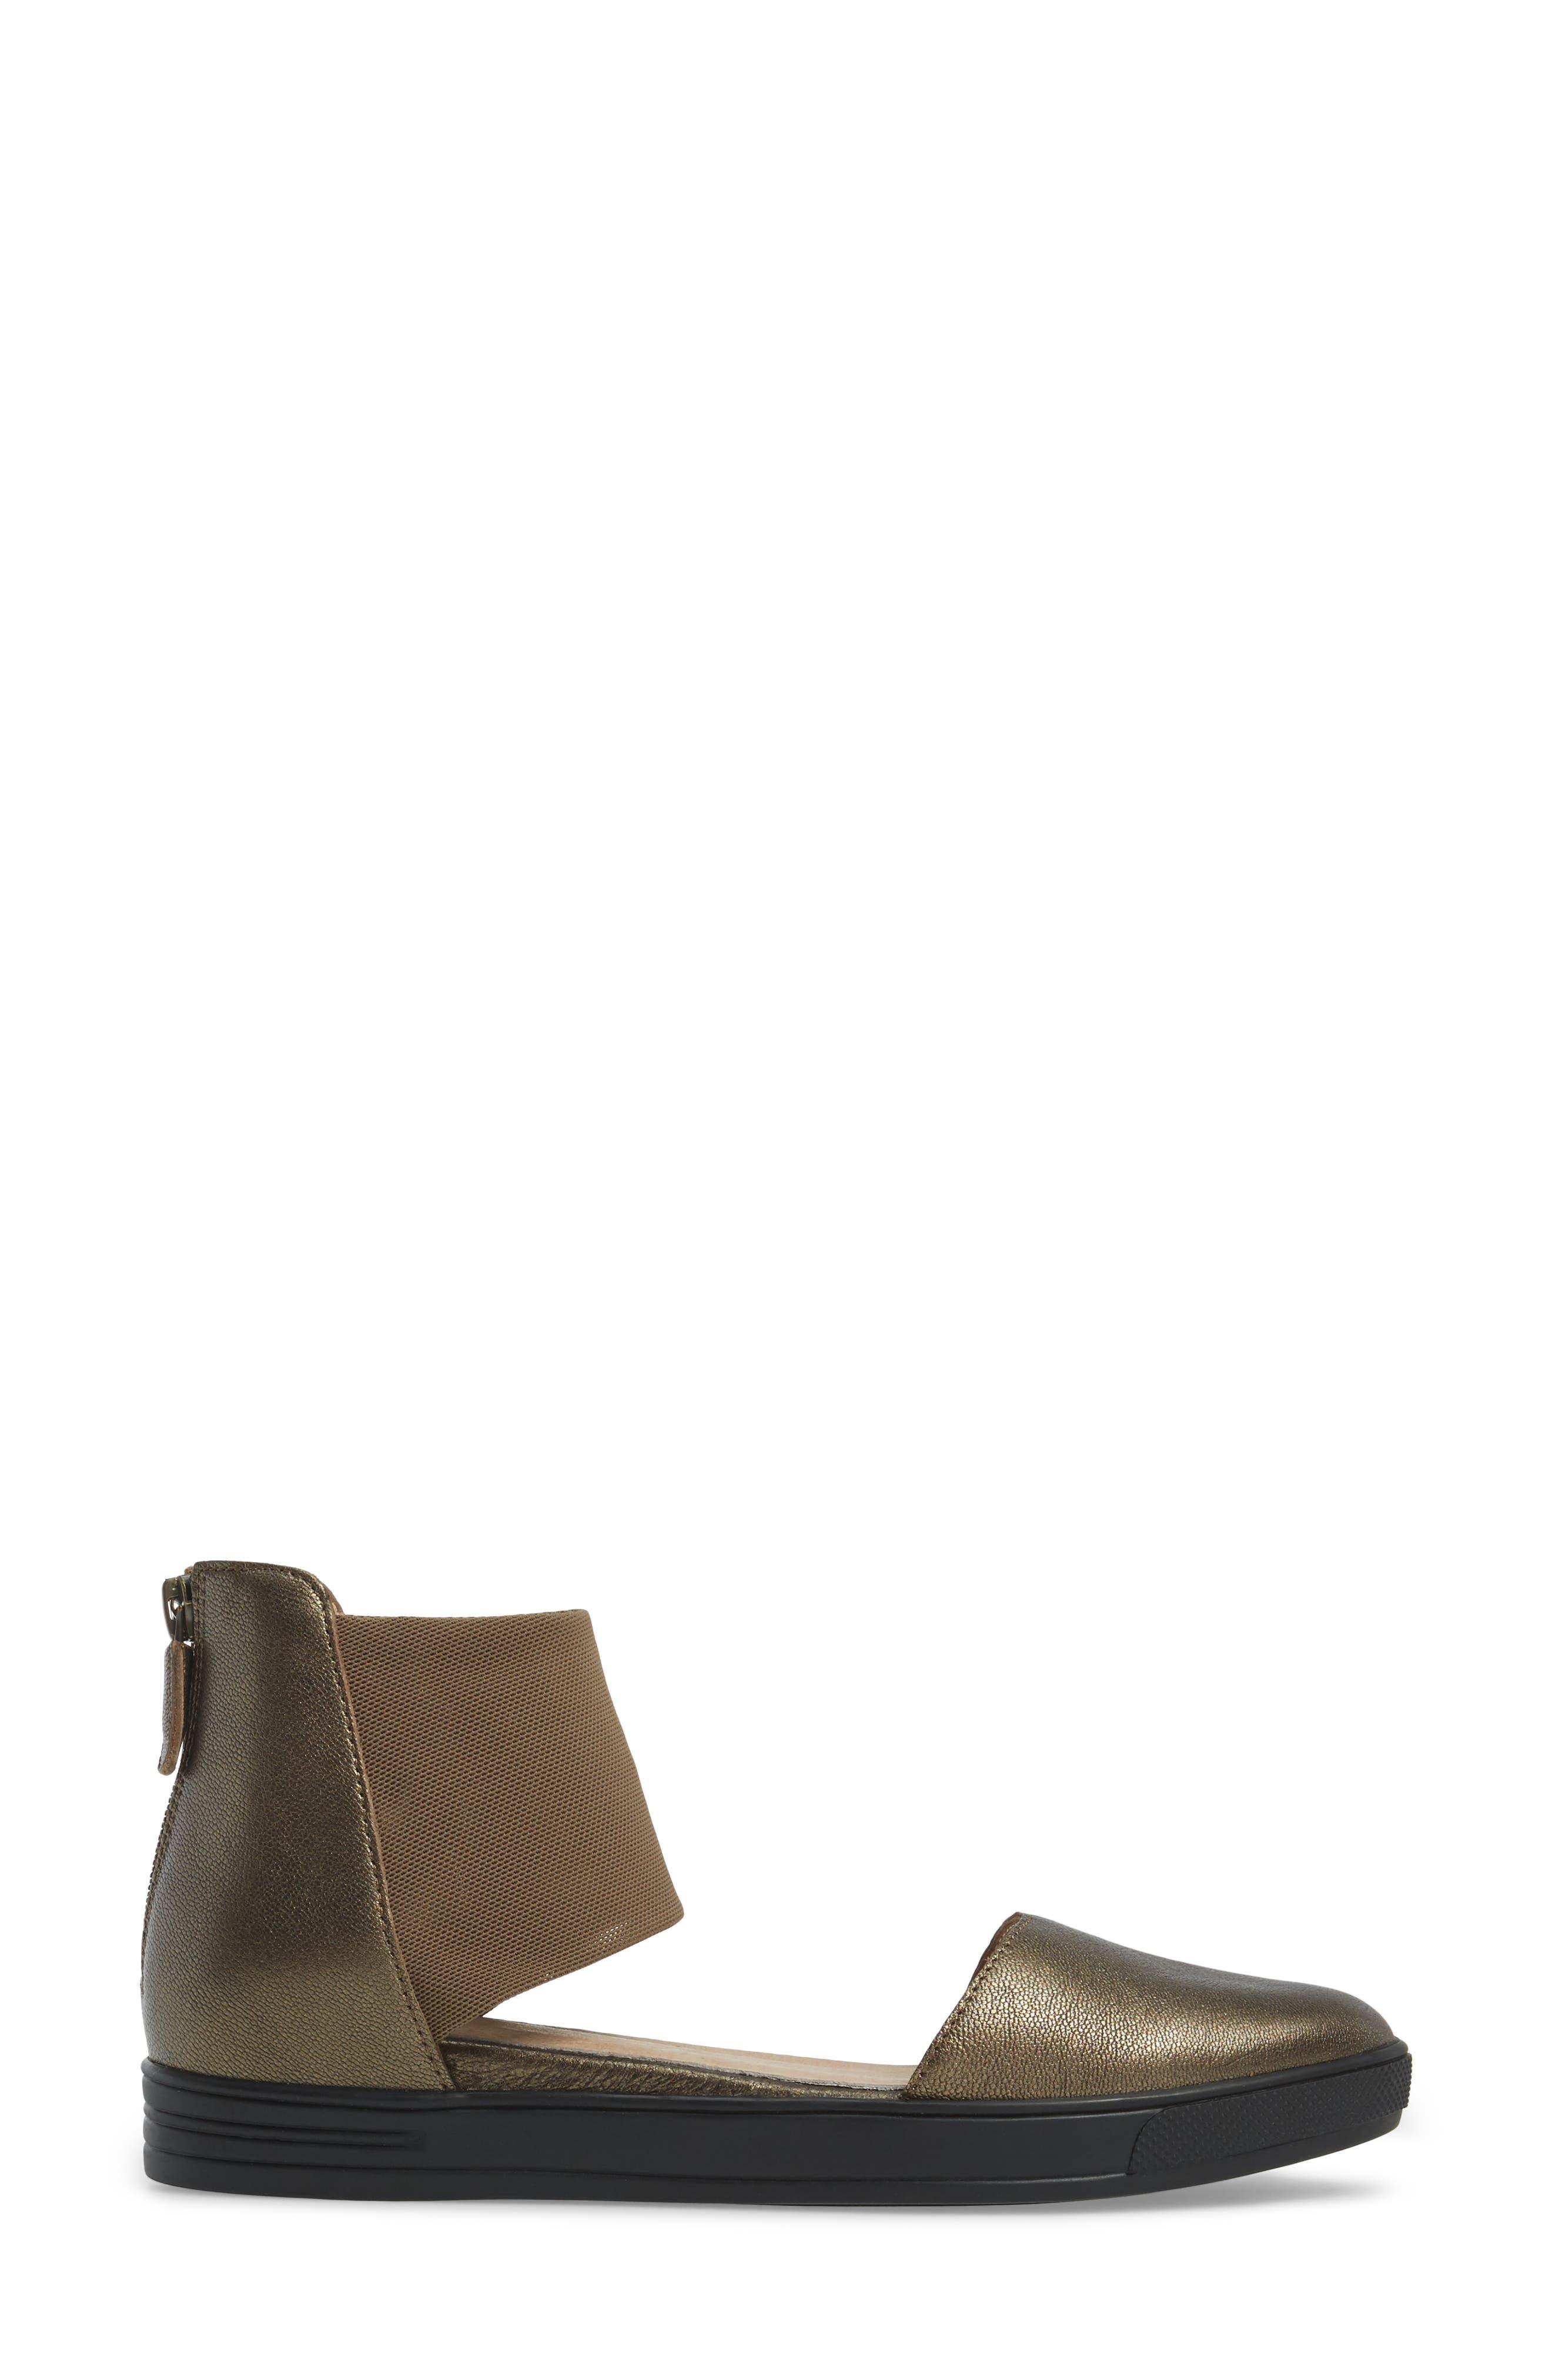 Alternate Image 3  - Eileen Fisher Powell Ankle Cuff Sandal(Women)